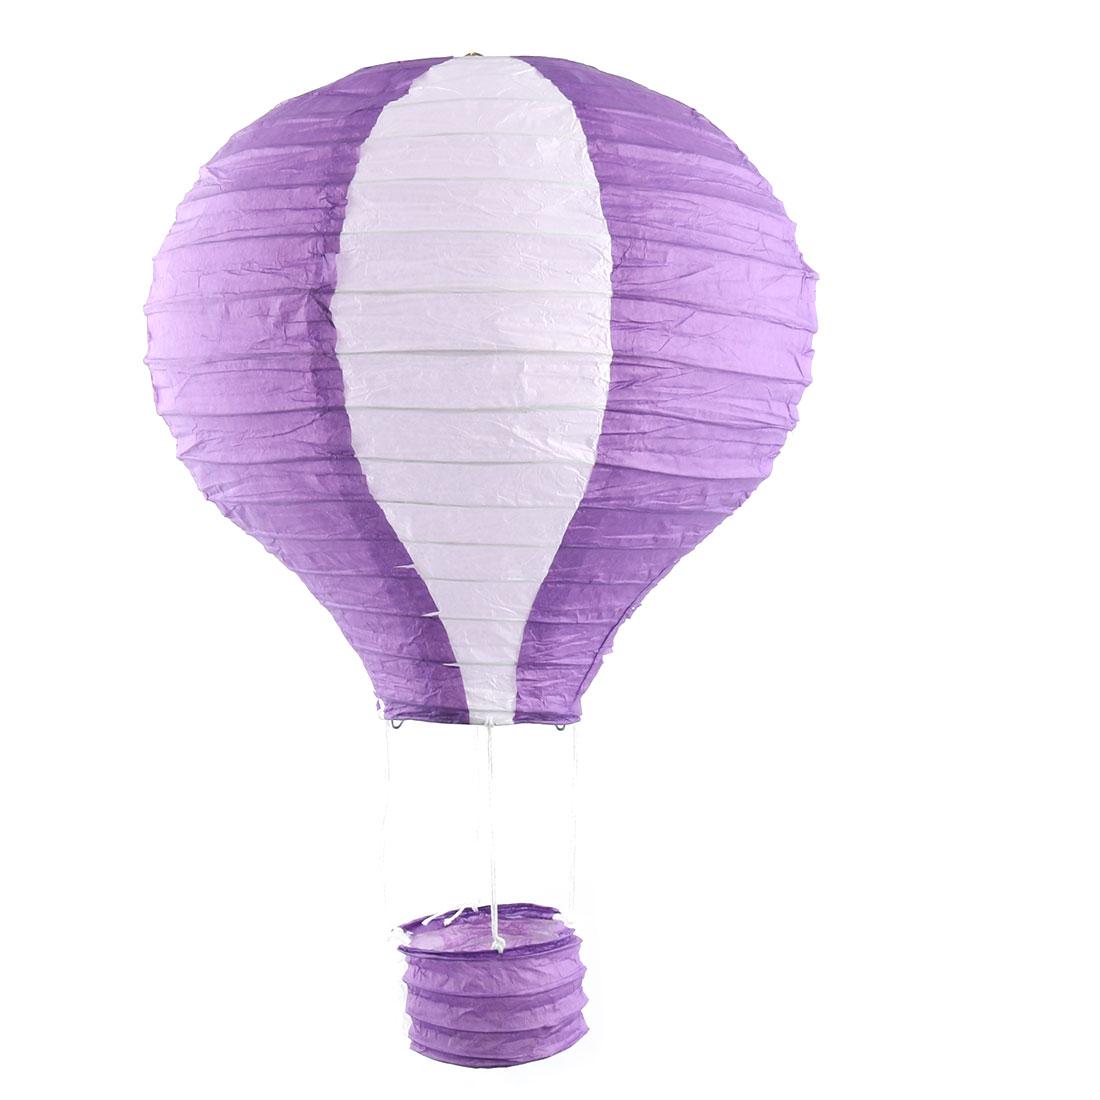 Engagement Festival Party Paper DIY Handmade Lightless Hanging Hot Air Balloon Lantern Purple White